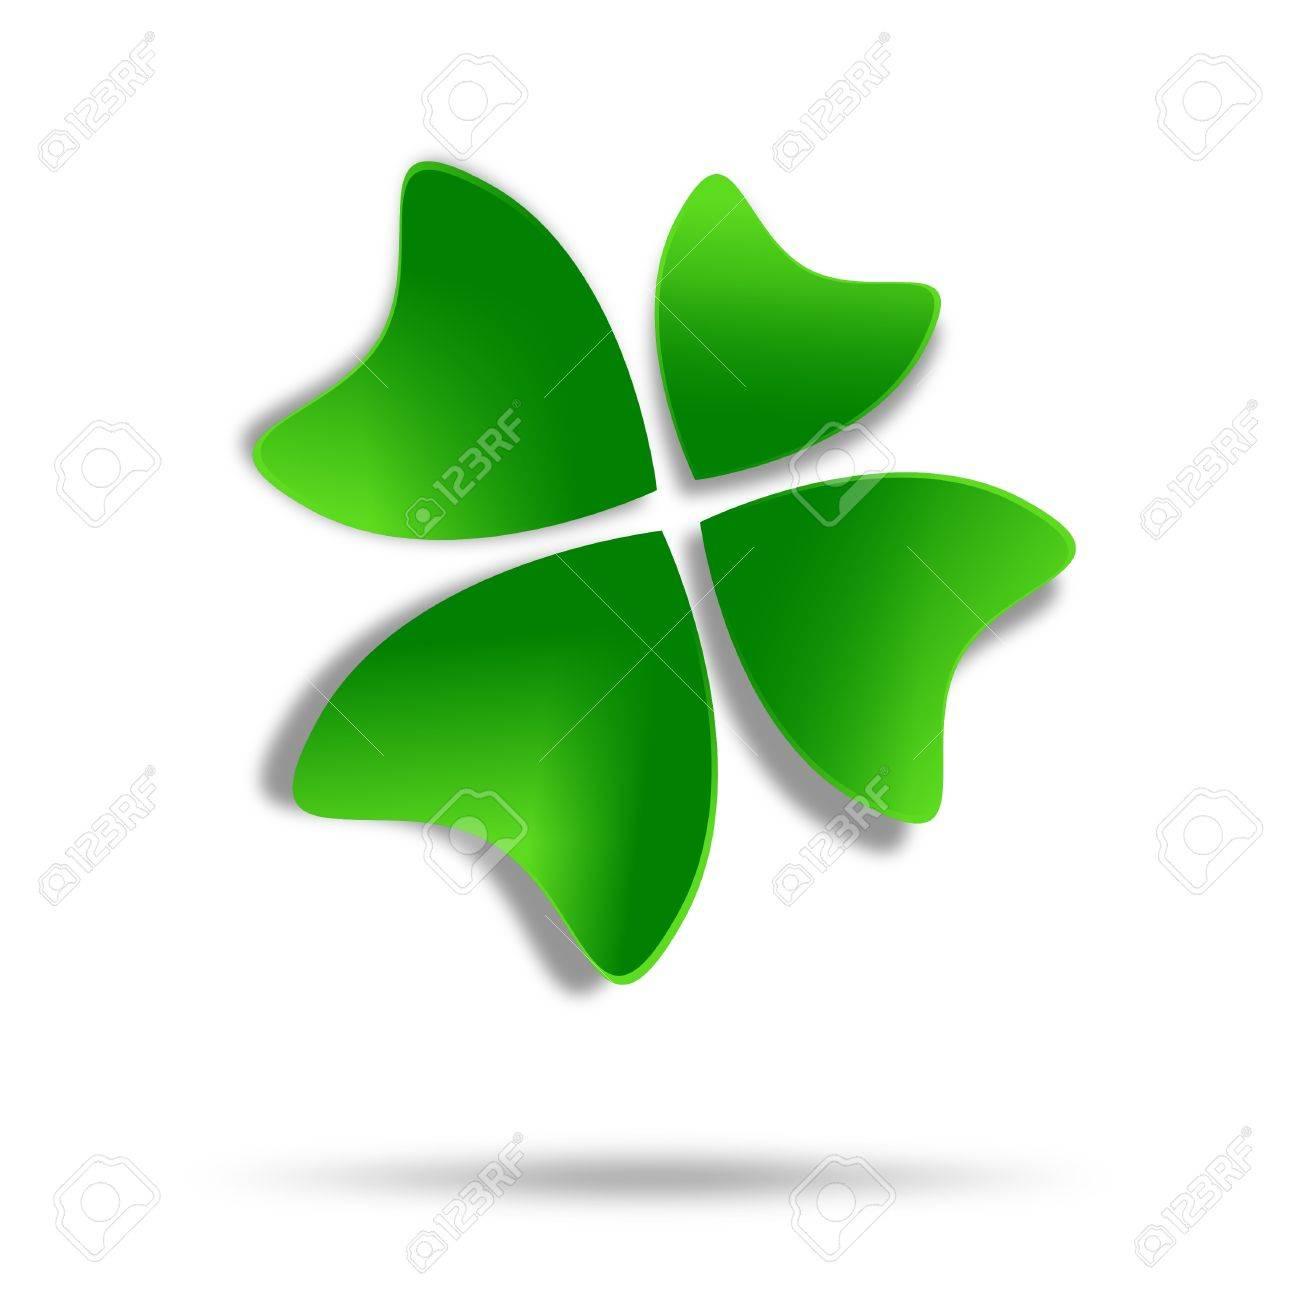 Multicolor four-leaf clover logo design Stock Photo - 19751046